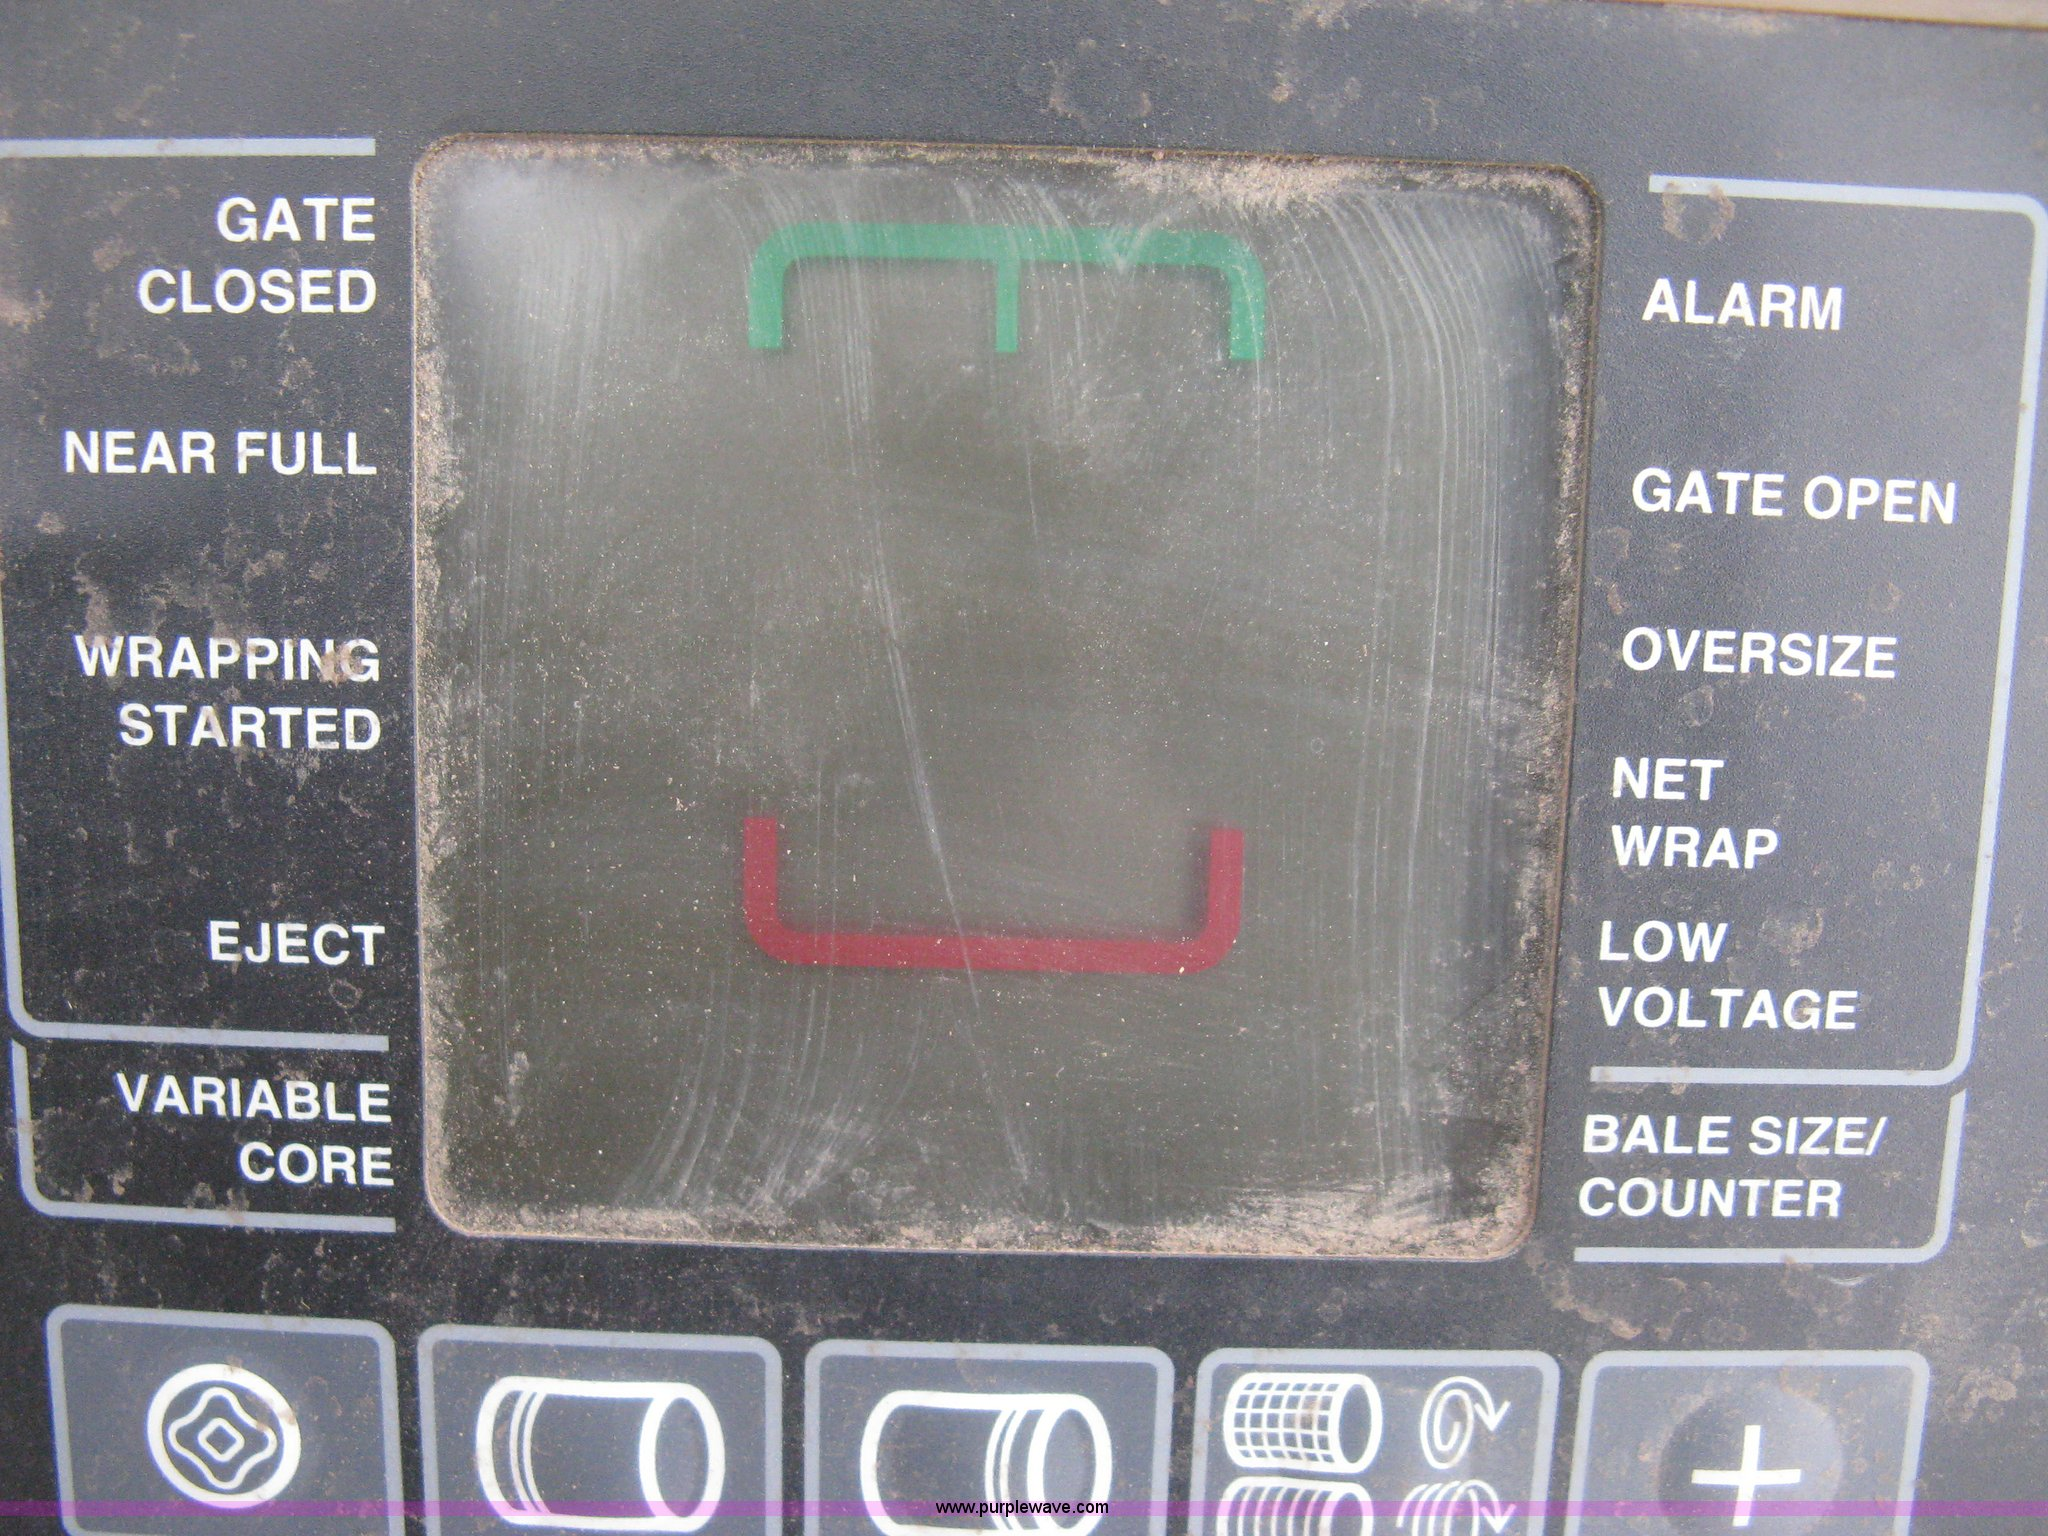 John deere bale trak monitor manual